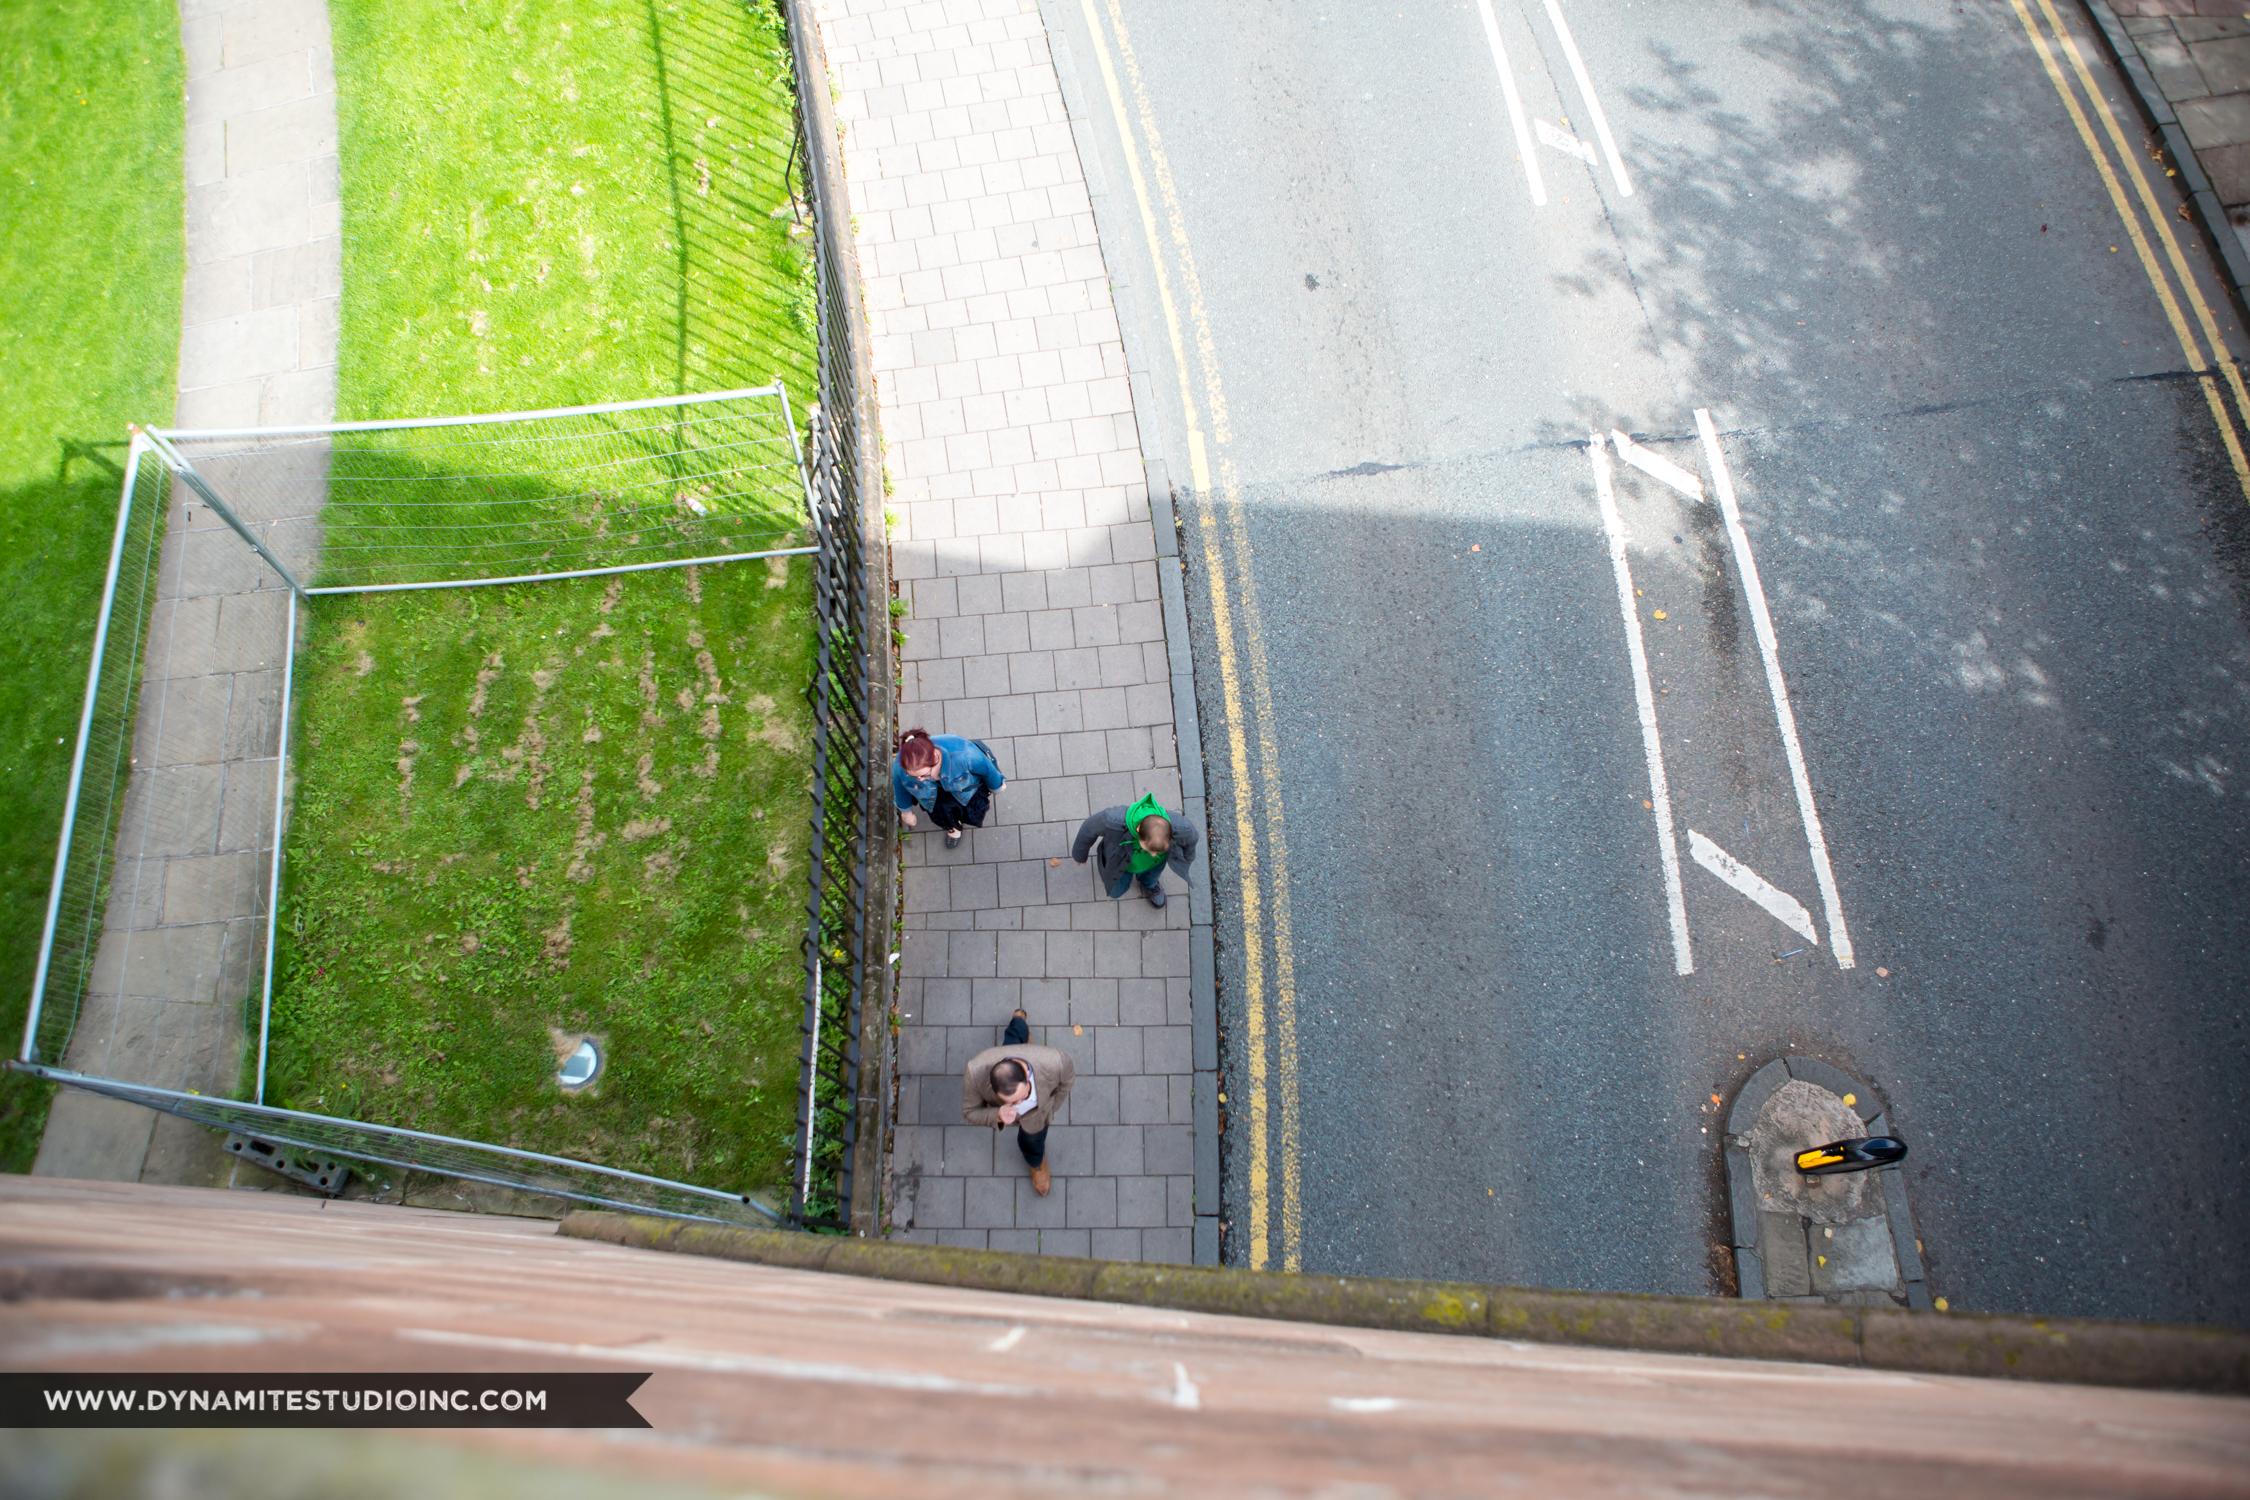 www.dynamitestudioinc.com-chester-england-travel-photography-orlando-1.jpg